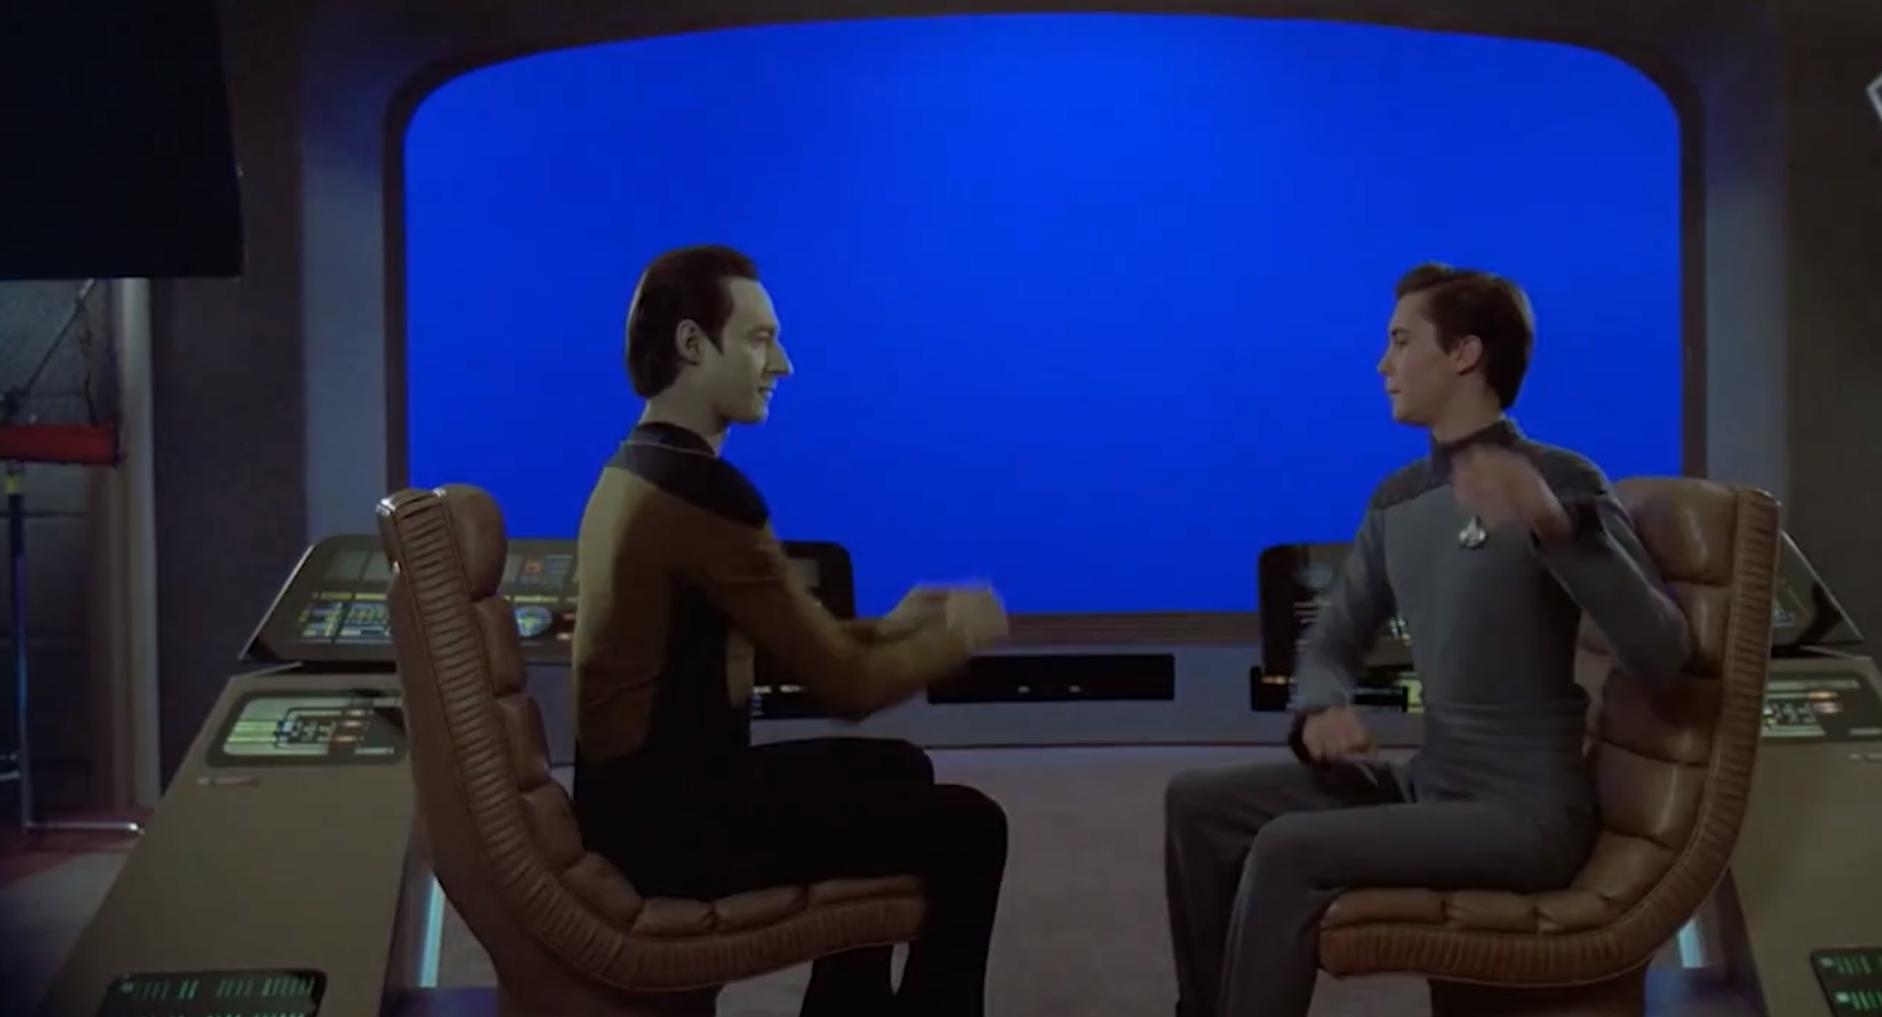 Star Trek: The Next Generation blooper reel